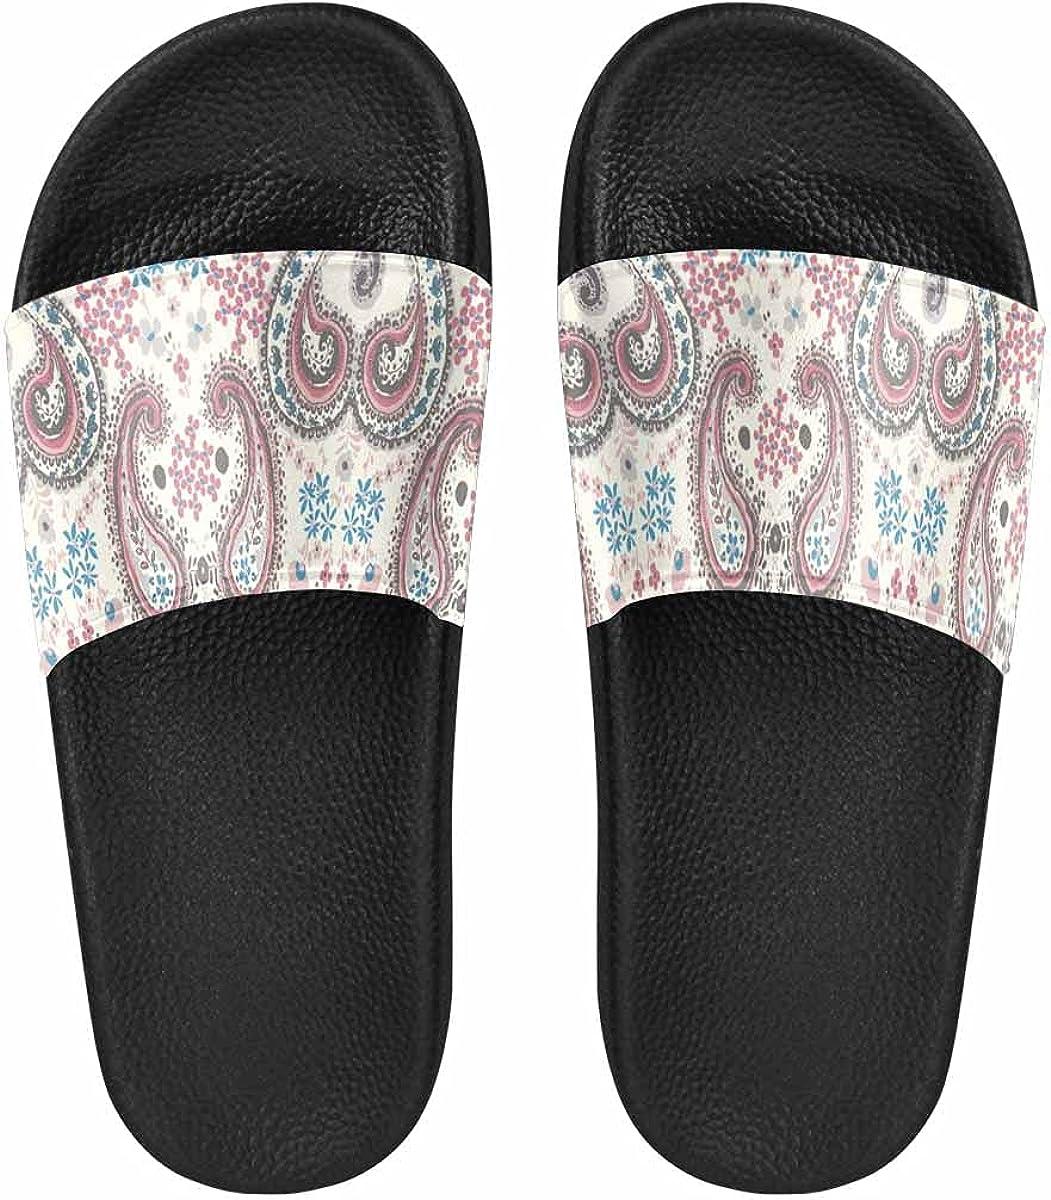 InterestPrint Fashion Watermelon Art Women's Slide Sandal Summer Beach Travel Sandal Indoor Shoes